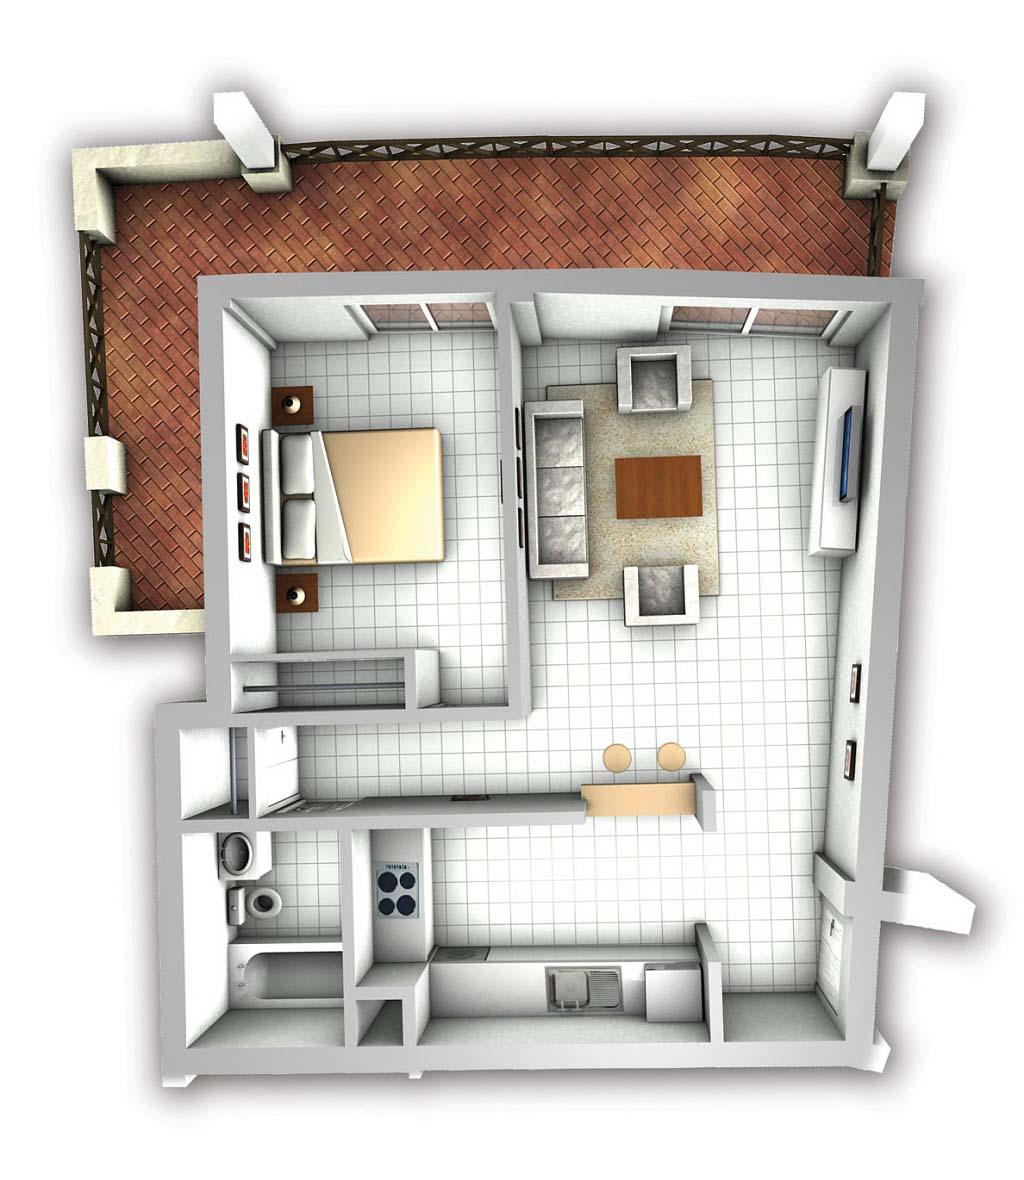 Creative Small Studio Apartment Floor Plans And Designs ...